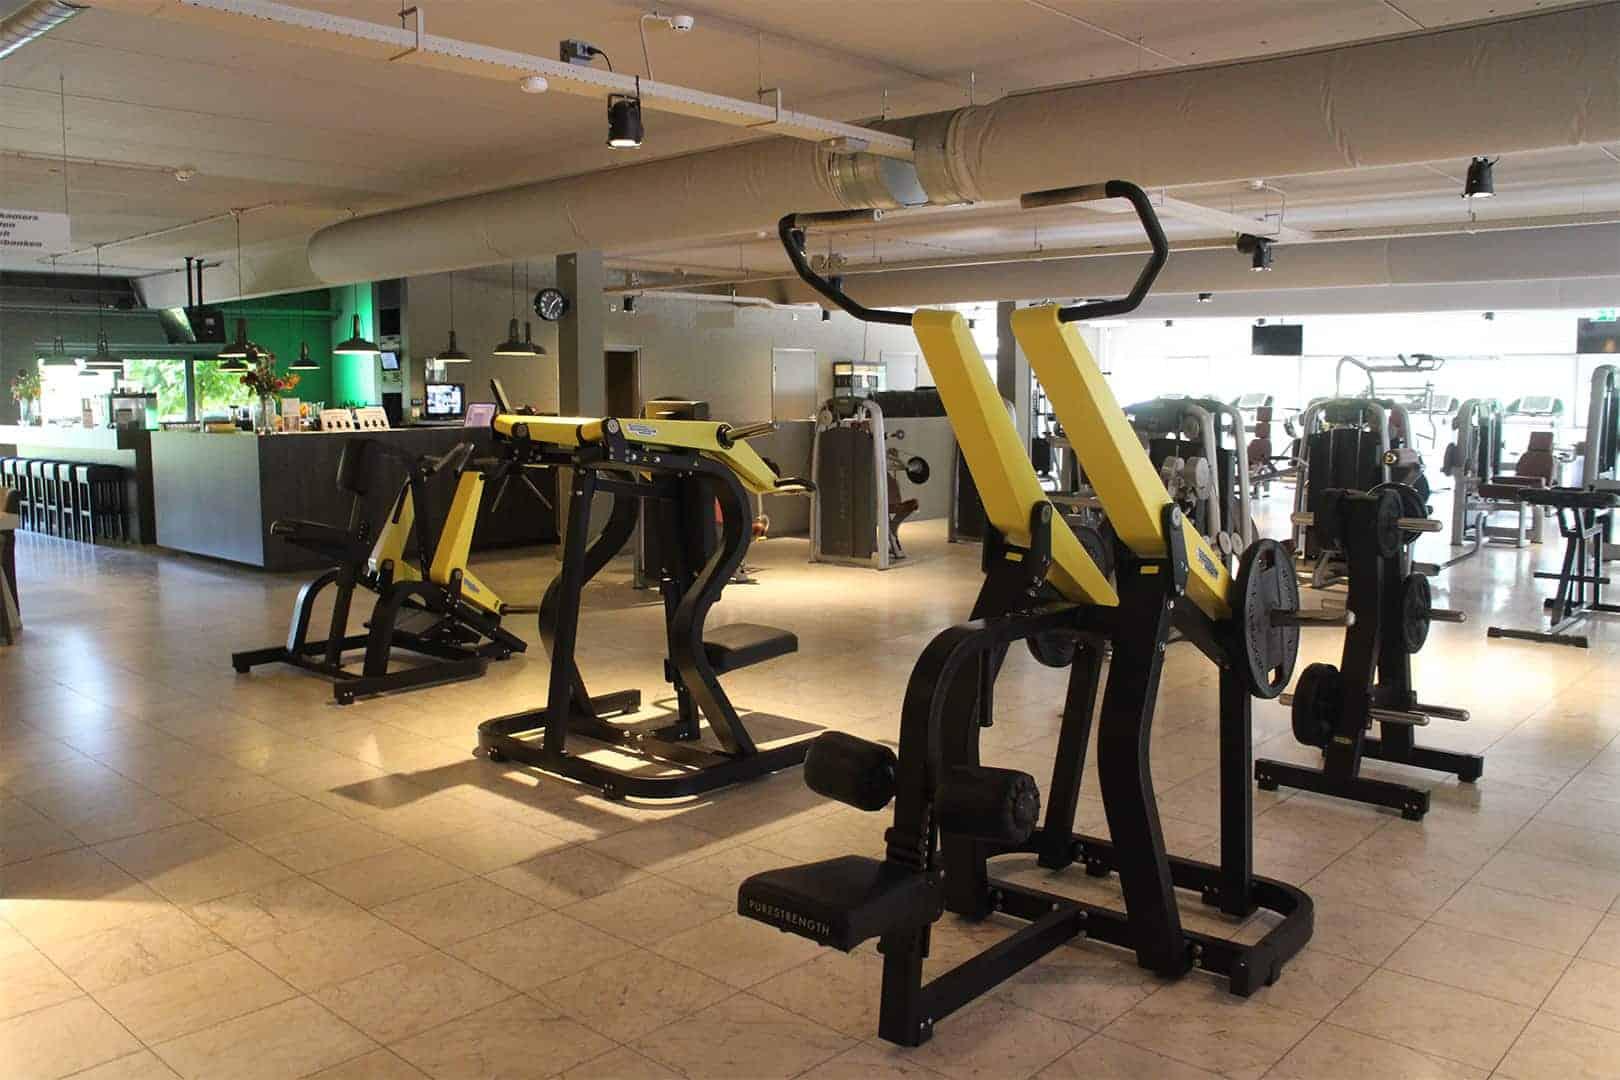 Fitness Studiosport Tubbergen 46